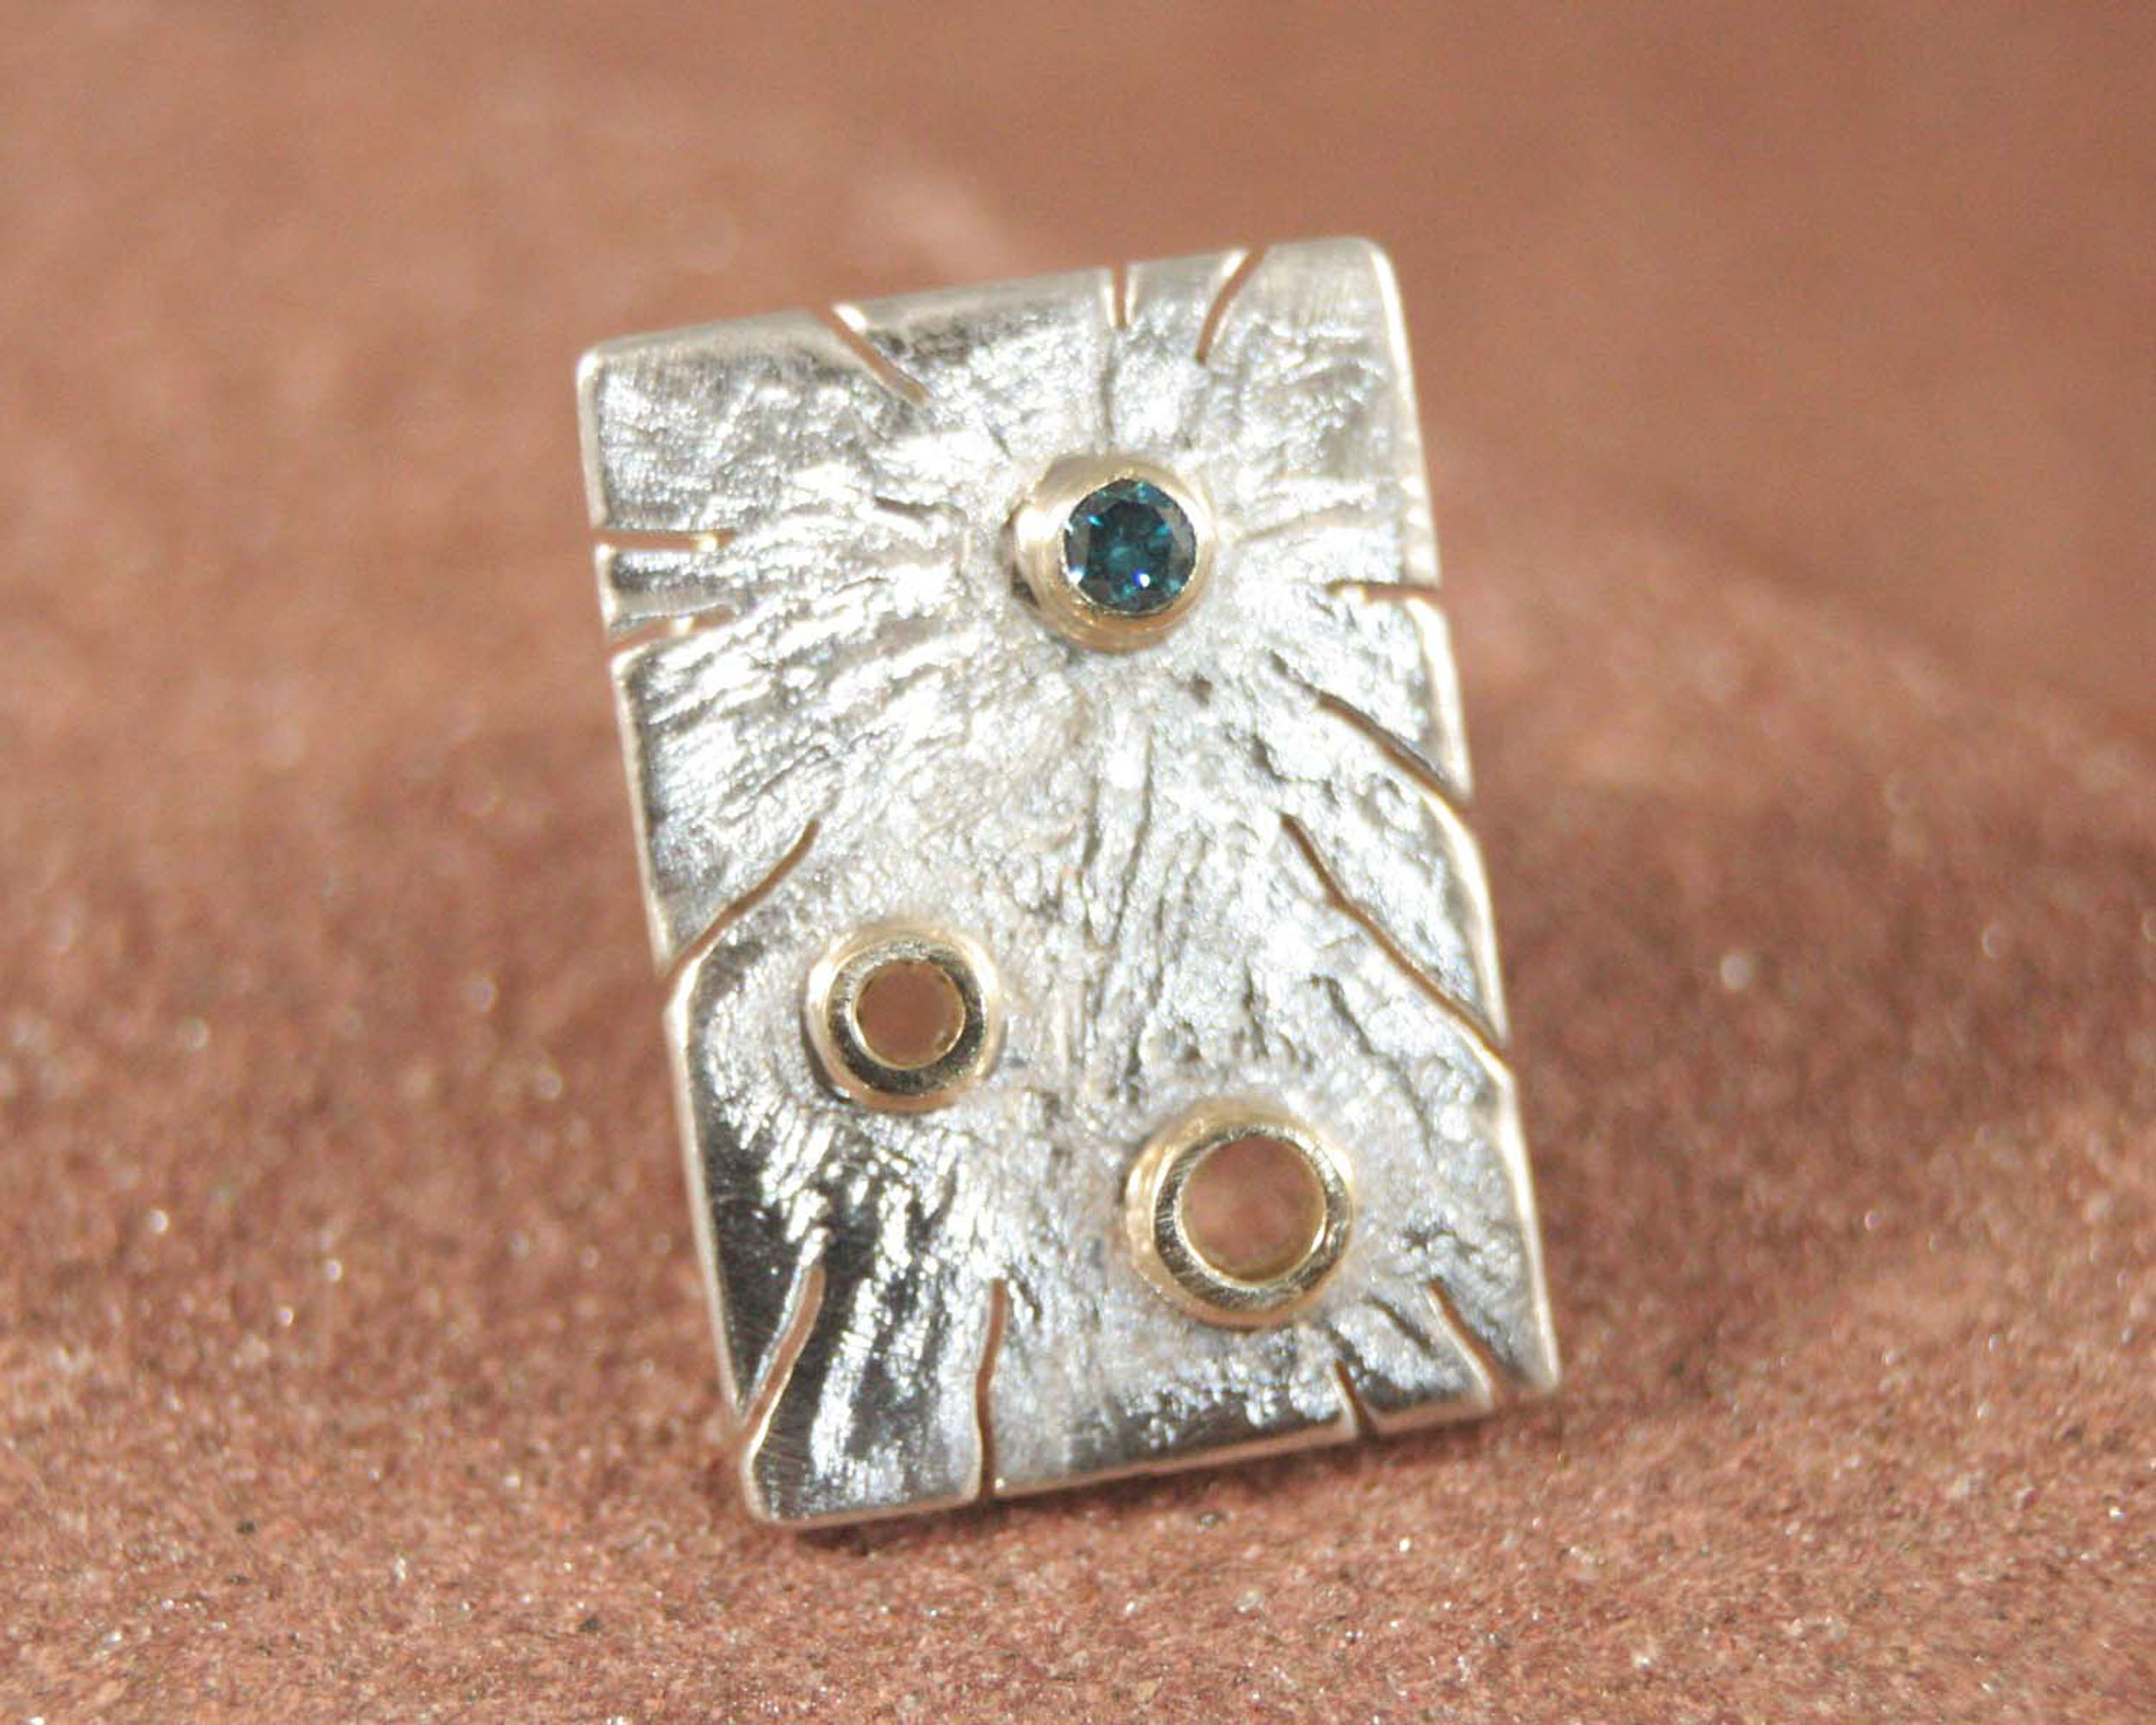 Reversknoop zilver, goud en blauwe diamant, unieke vormgeving. Handgemaakt LYAM edelsmeden.